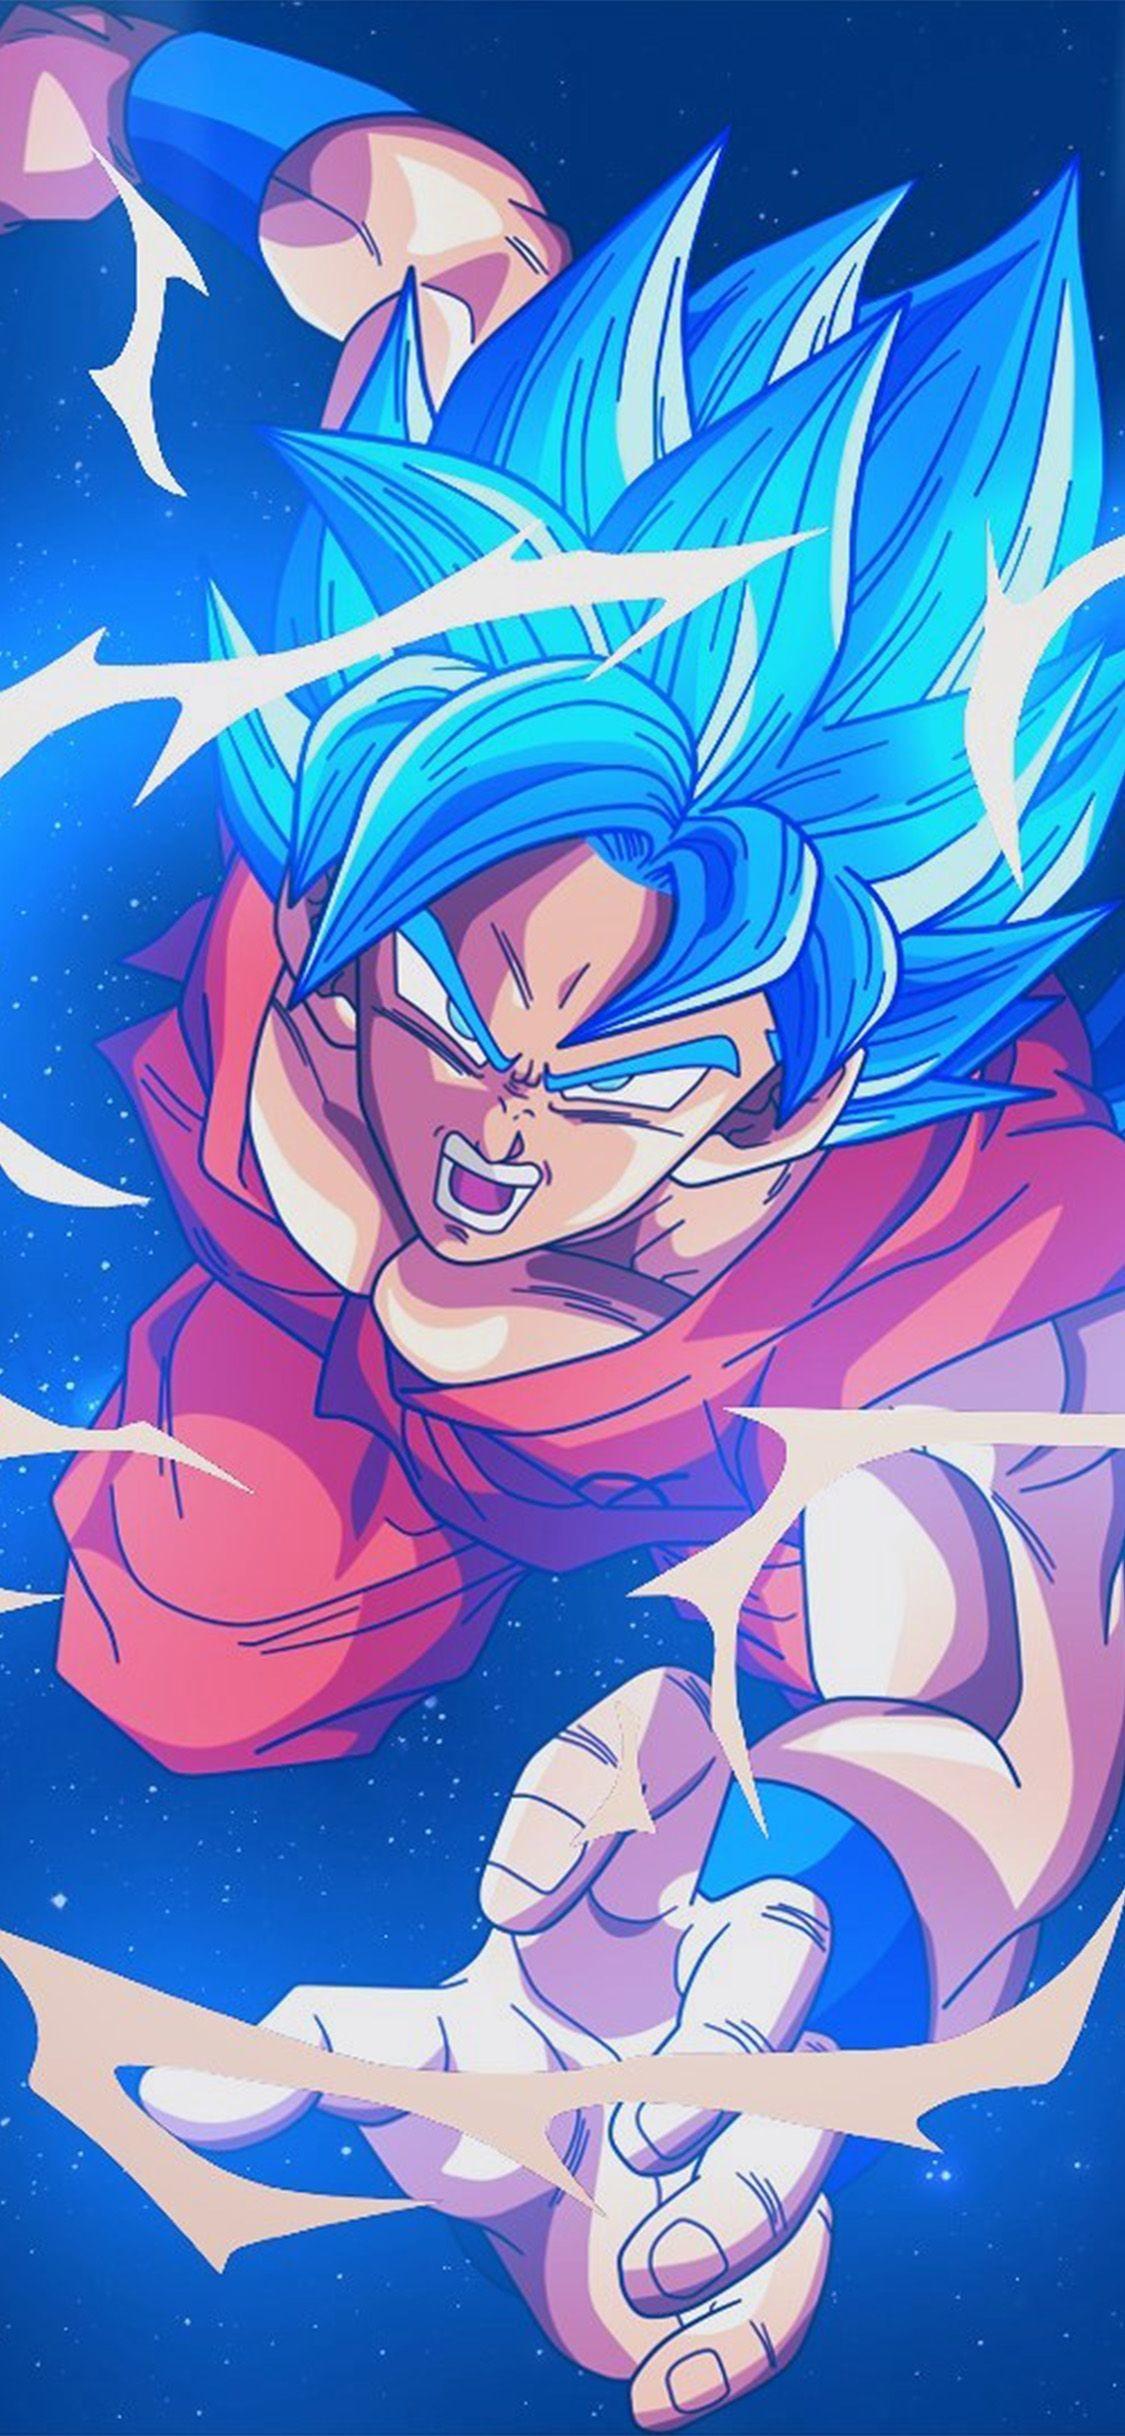 Res: 1125x2436, bc54-dragonball-goku-blue-art-illustration-anime via http: